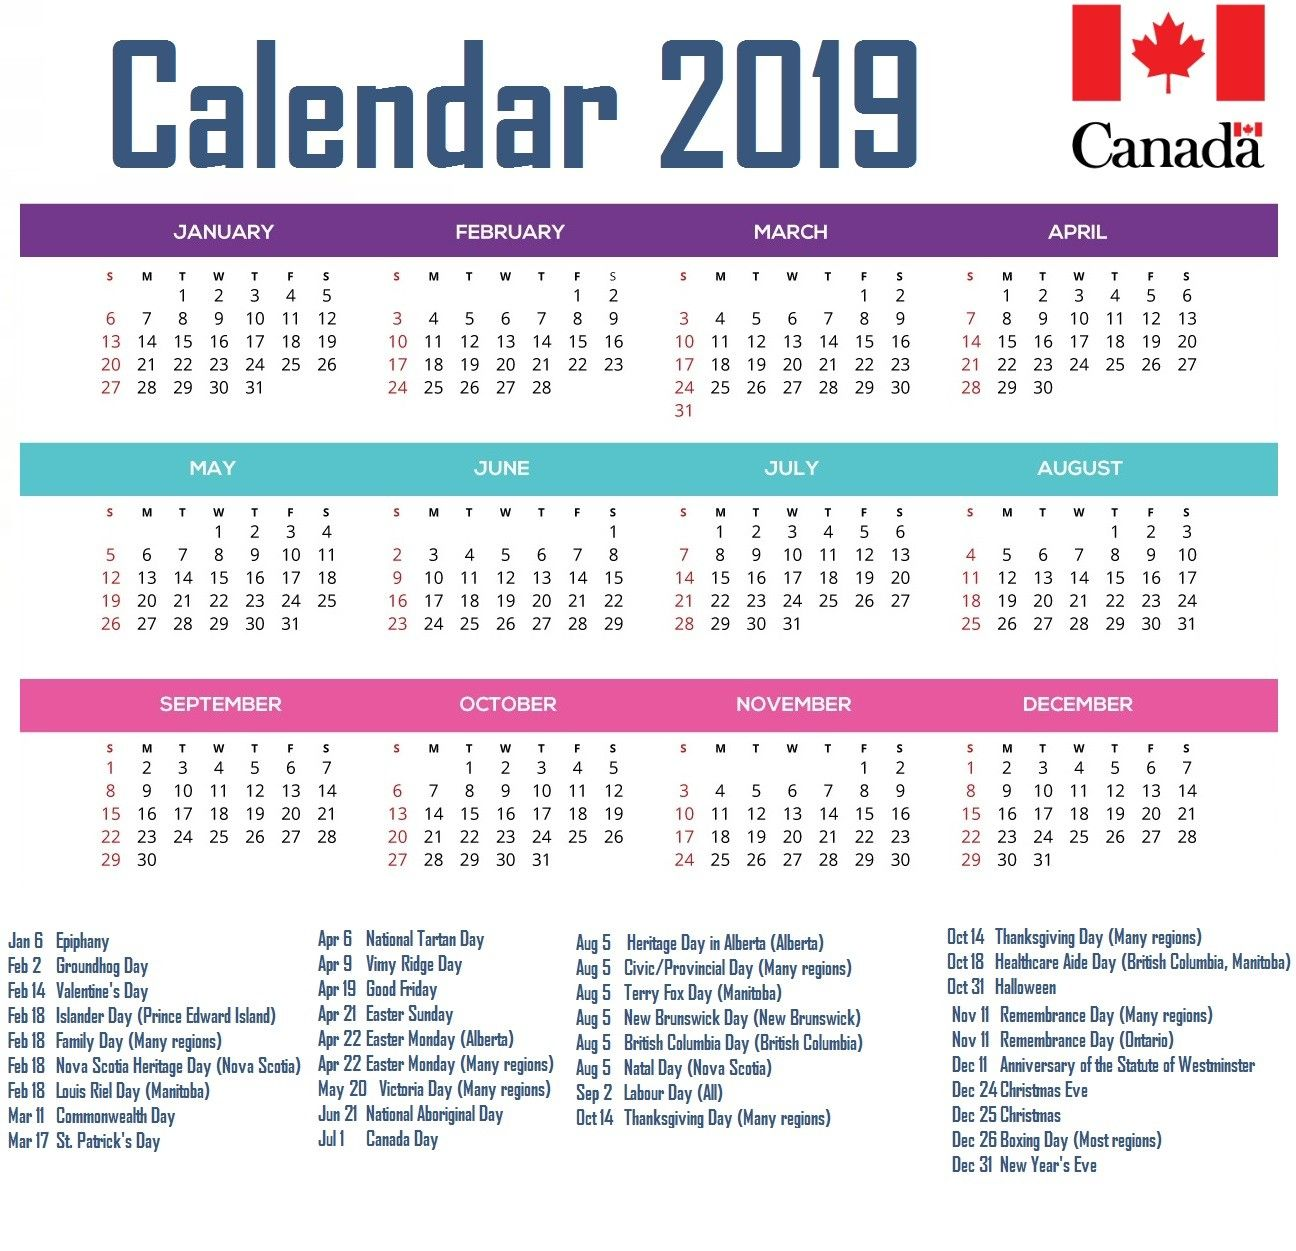 Canada 2019 Calendar With Holidays 2019 Calendars Pinterest